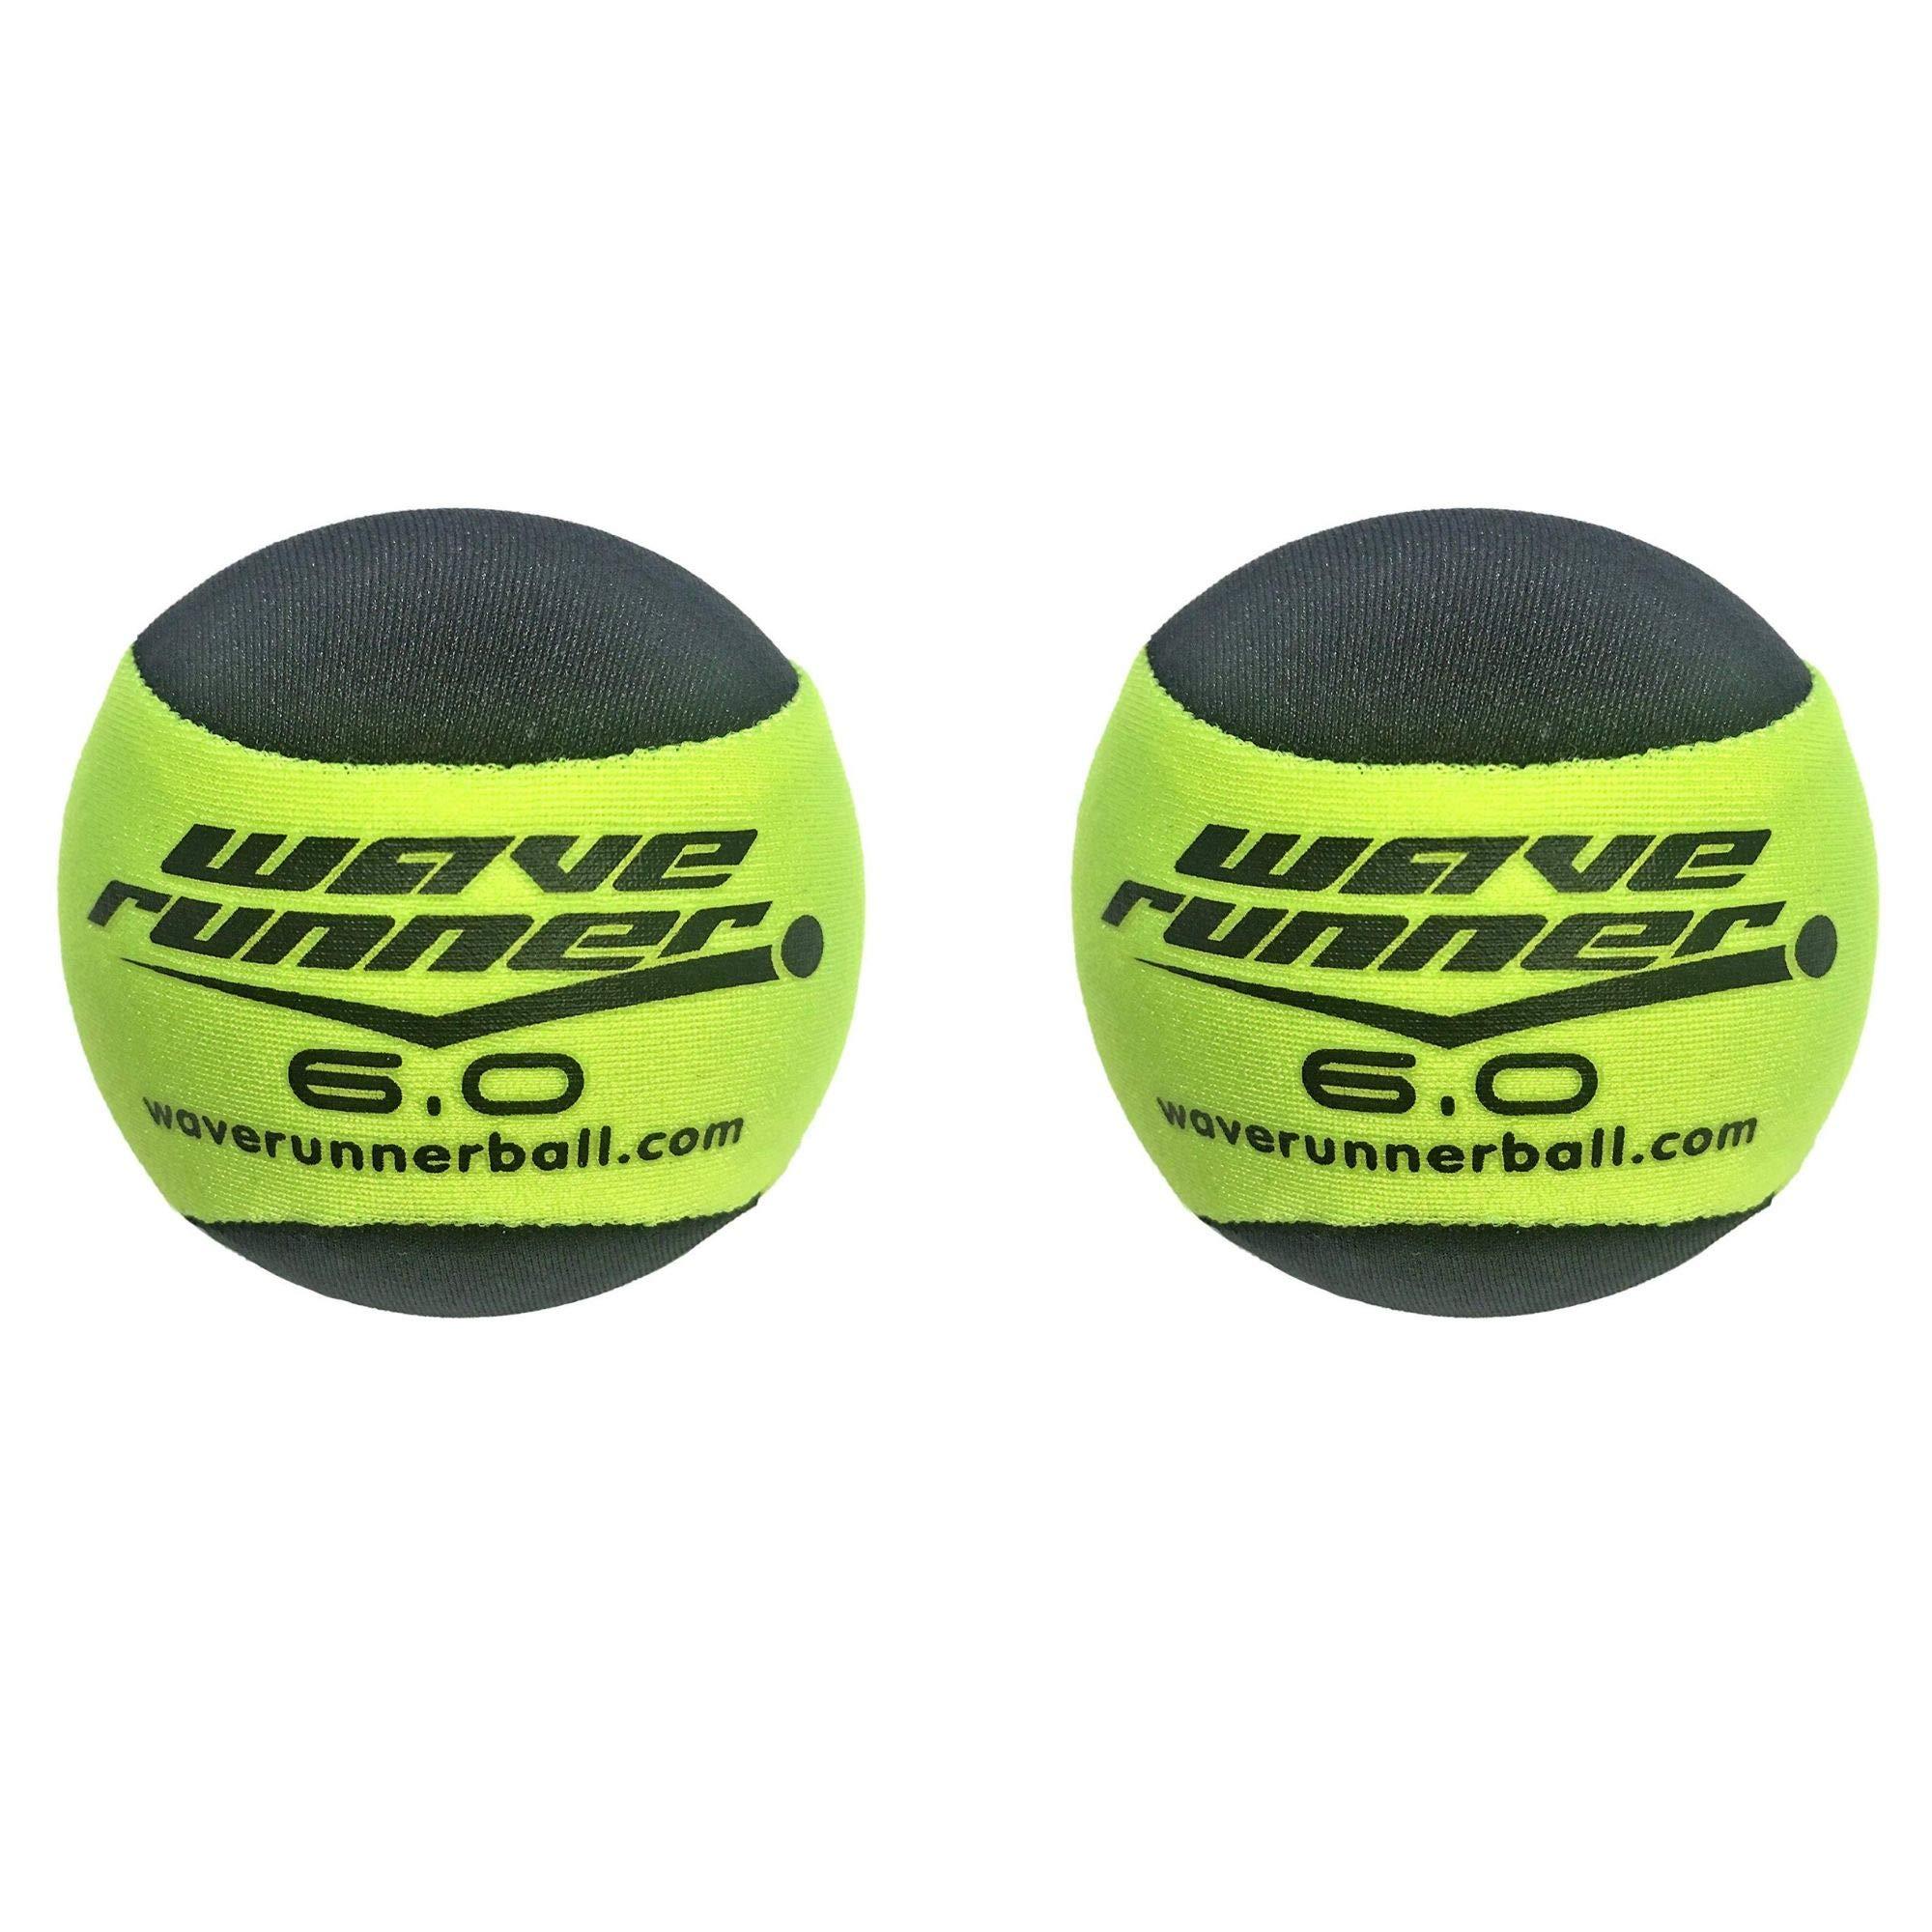 Wave Runner 6.0 Water Bouncing Ball (2-Pack)